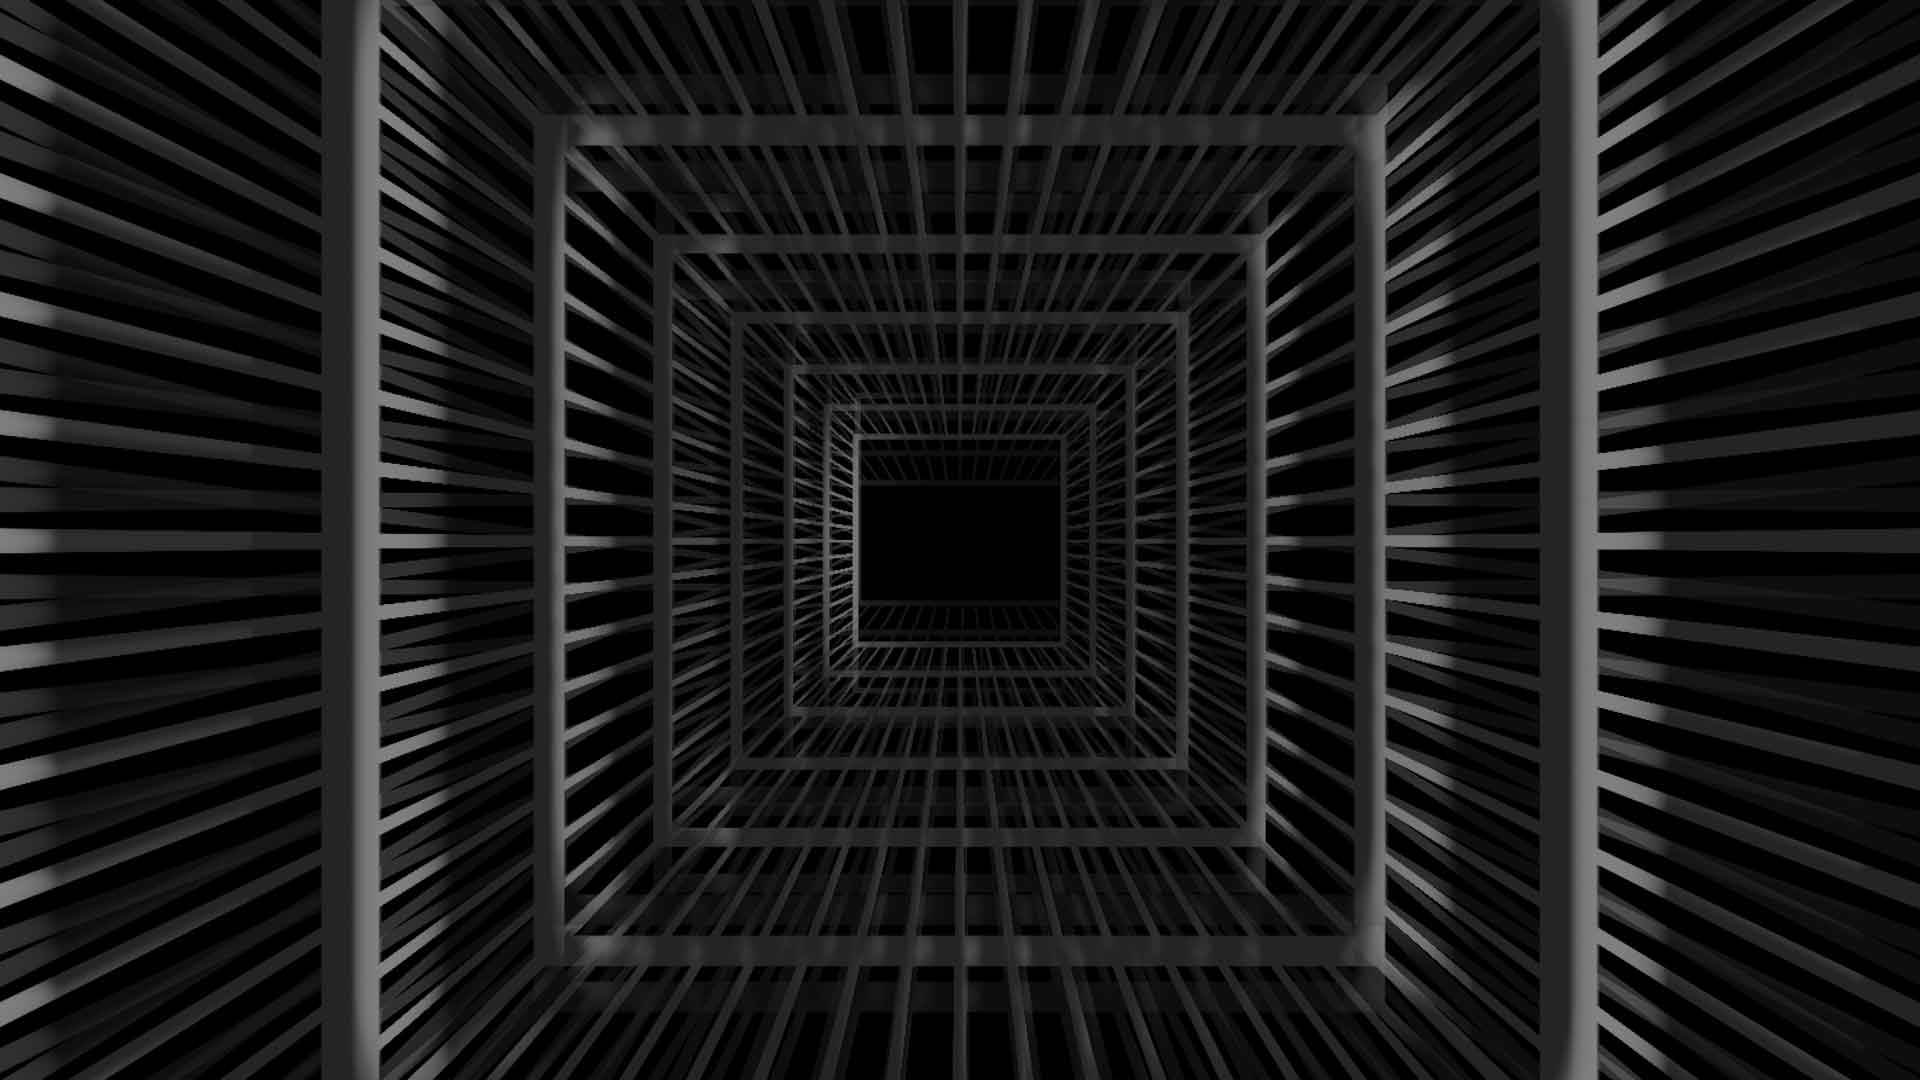 1920x1080 wallpaper dark